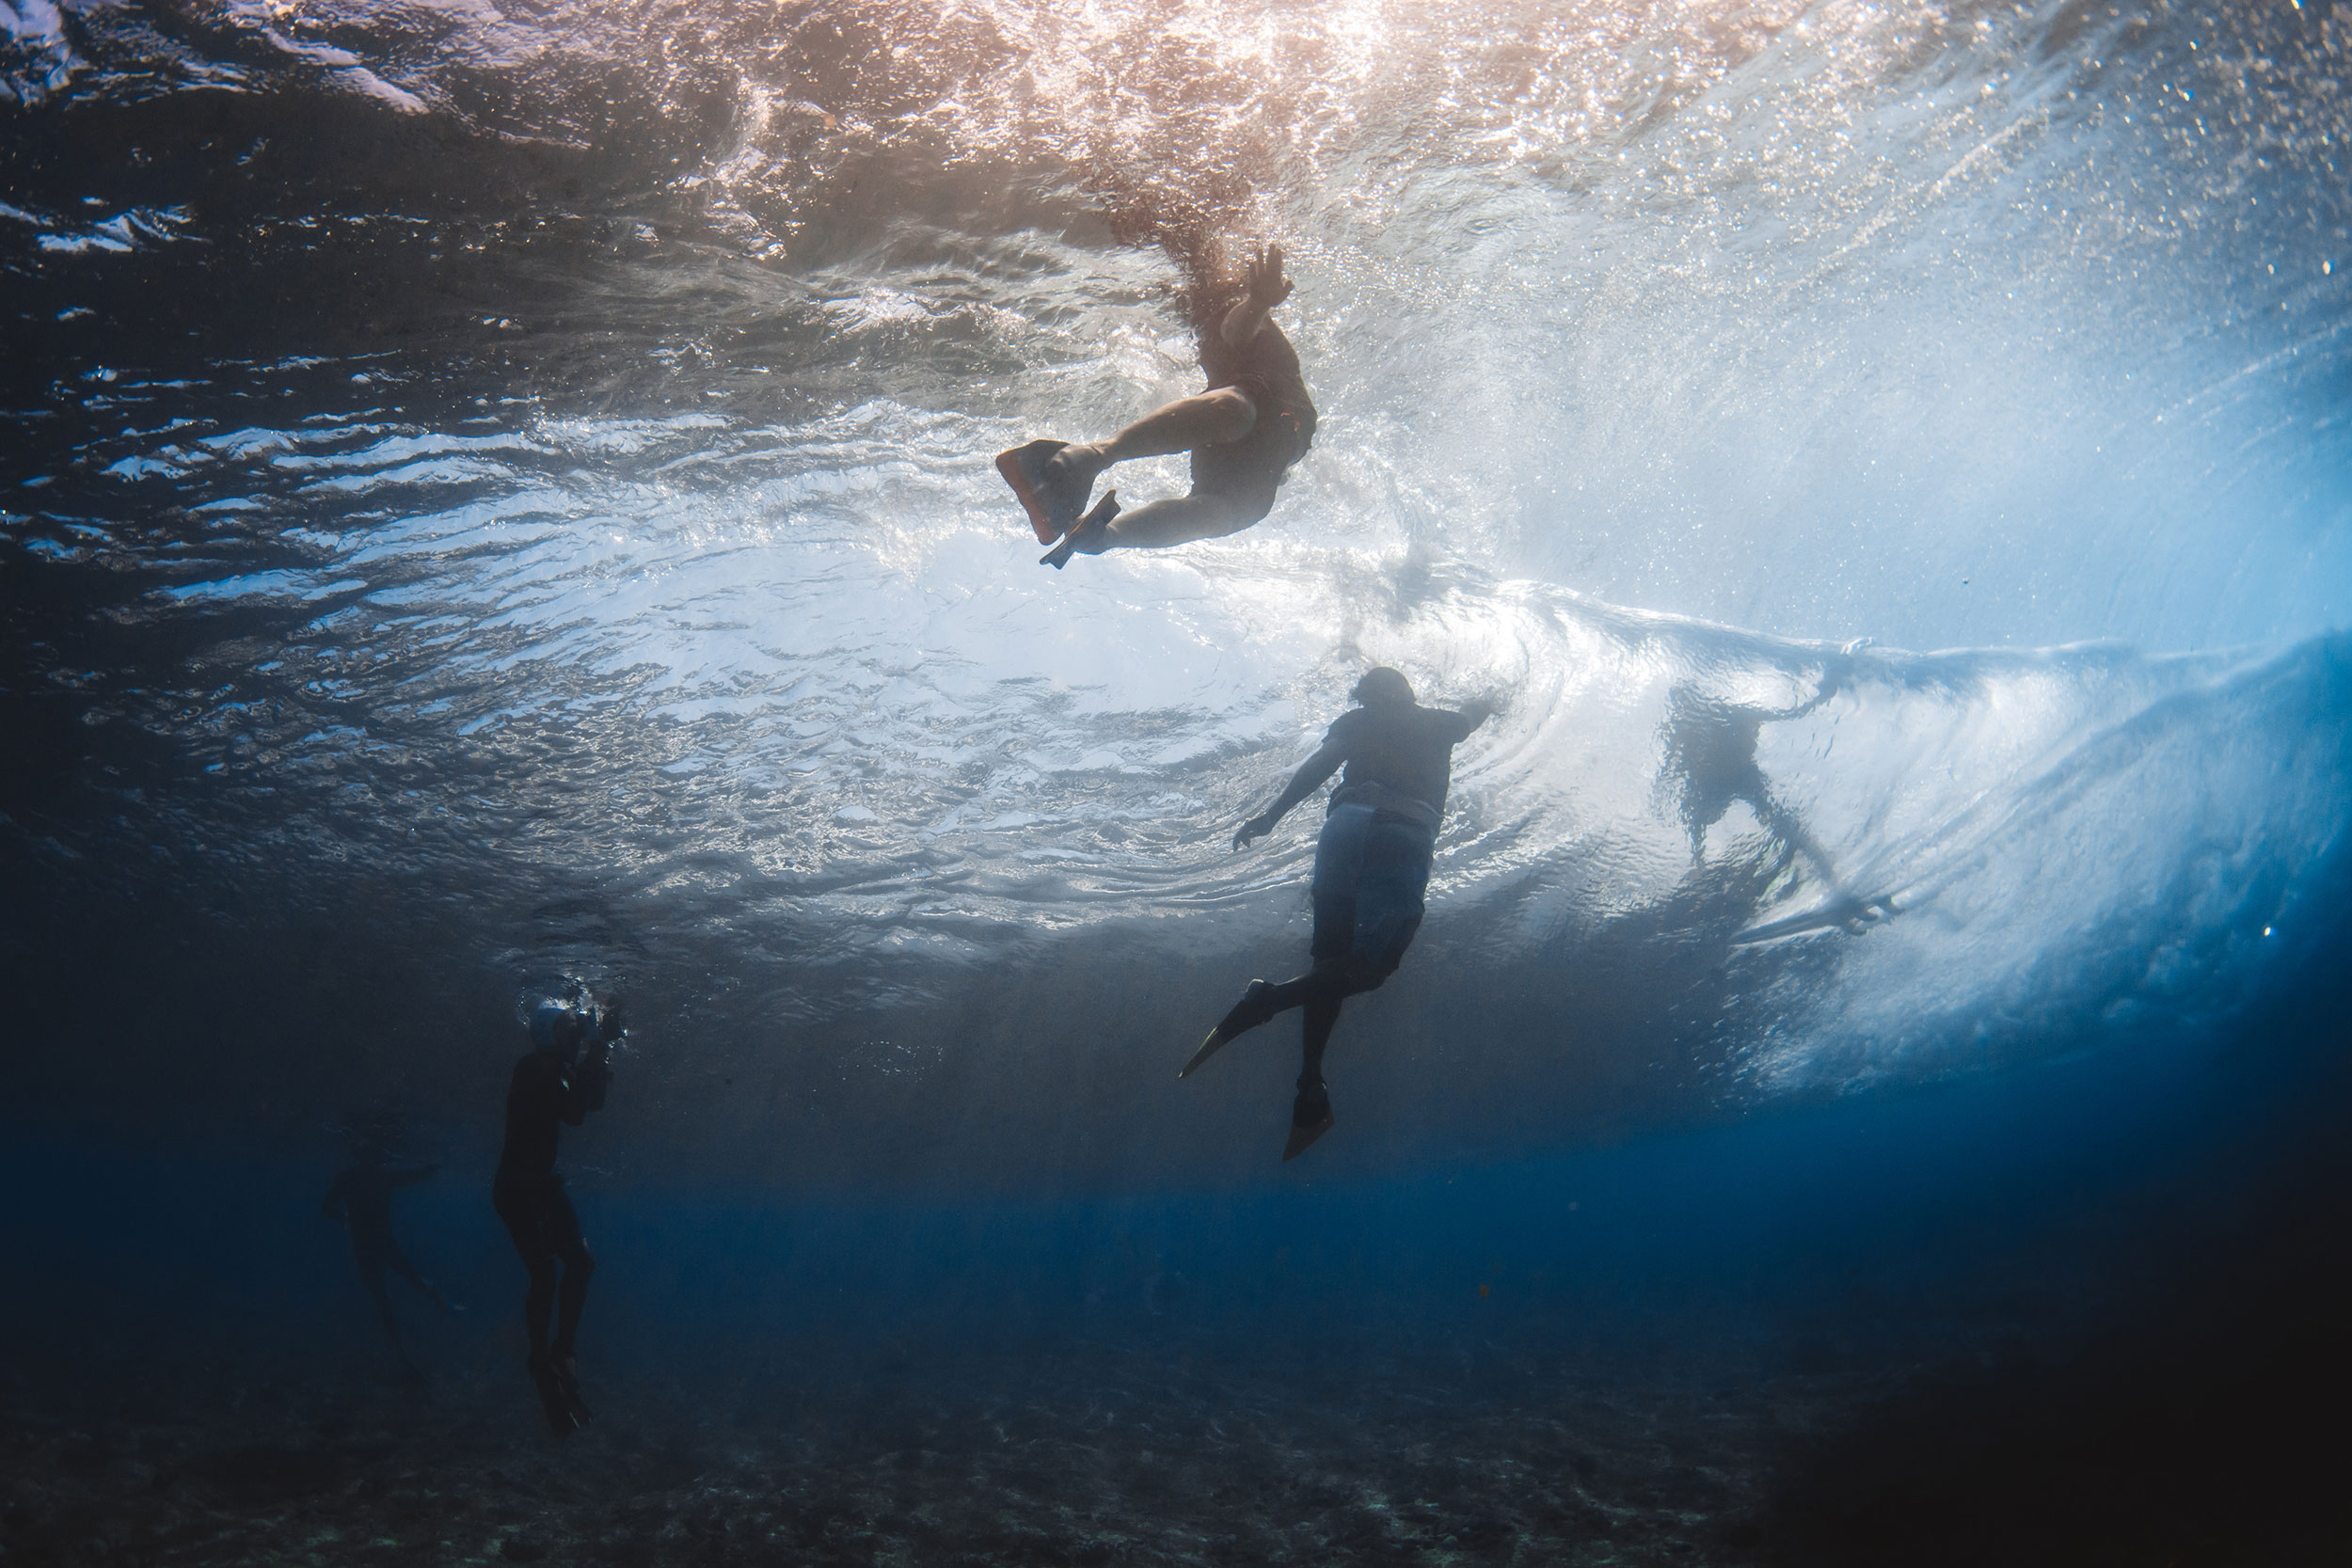 surf photographers